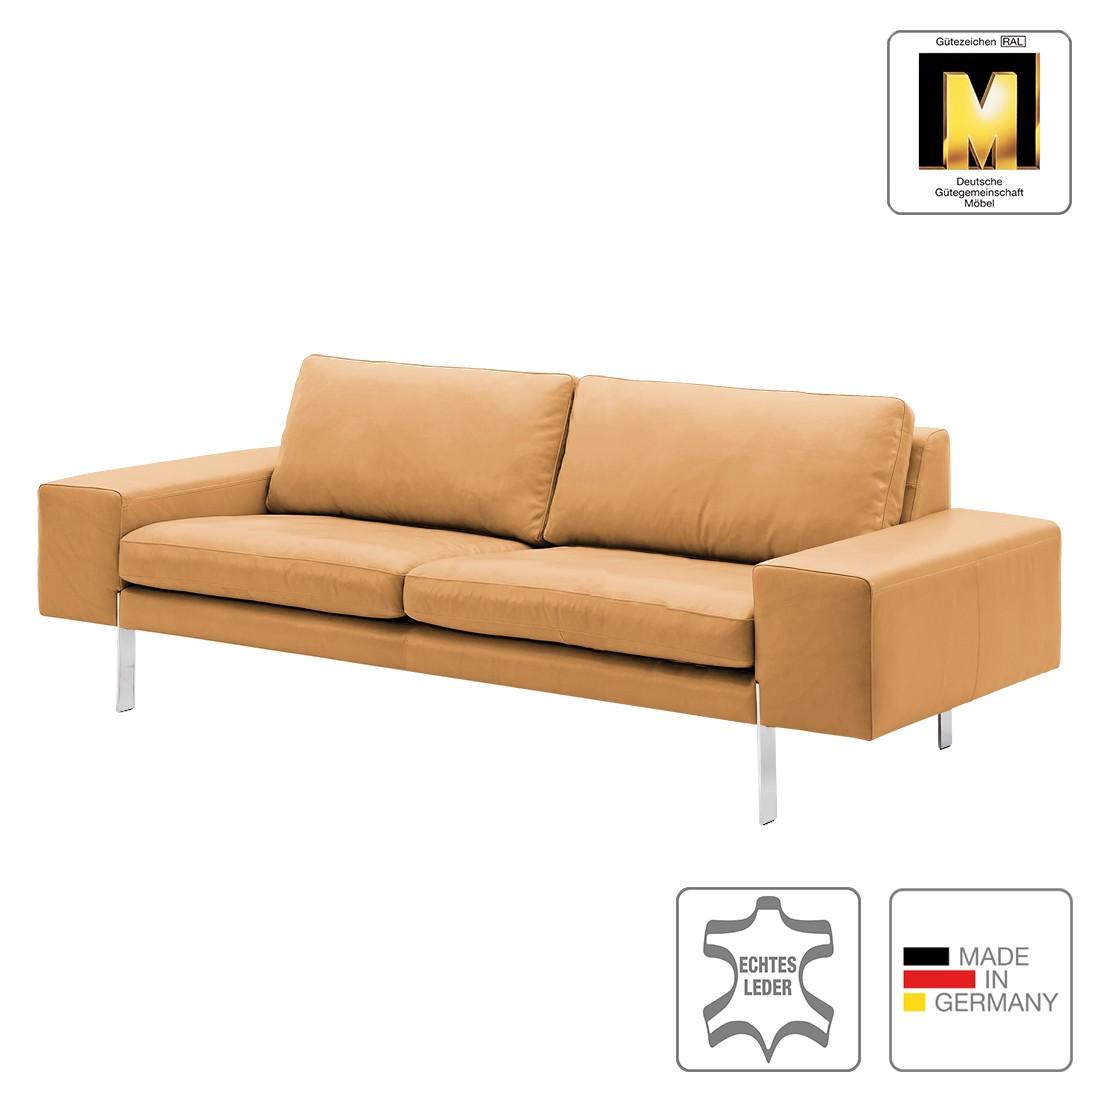 rolf benz sofa gebraucht berlin freistil 141. Black Bedroom Furniture Sets. Home Design Ideas